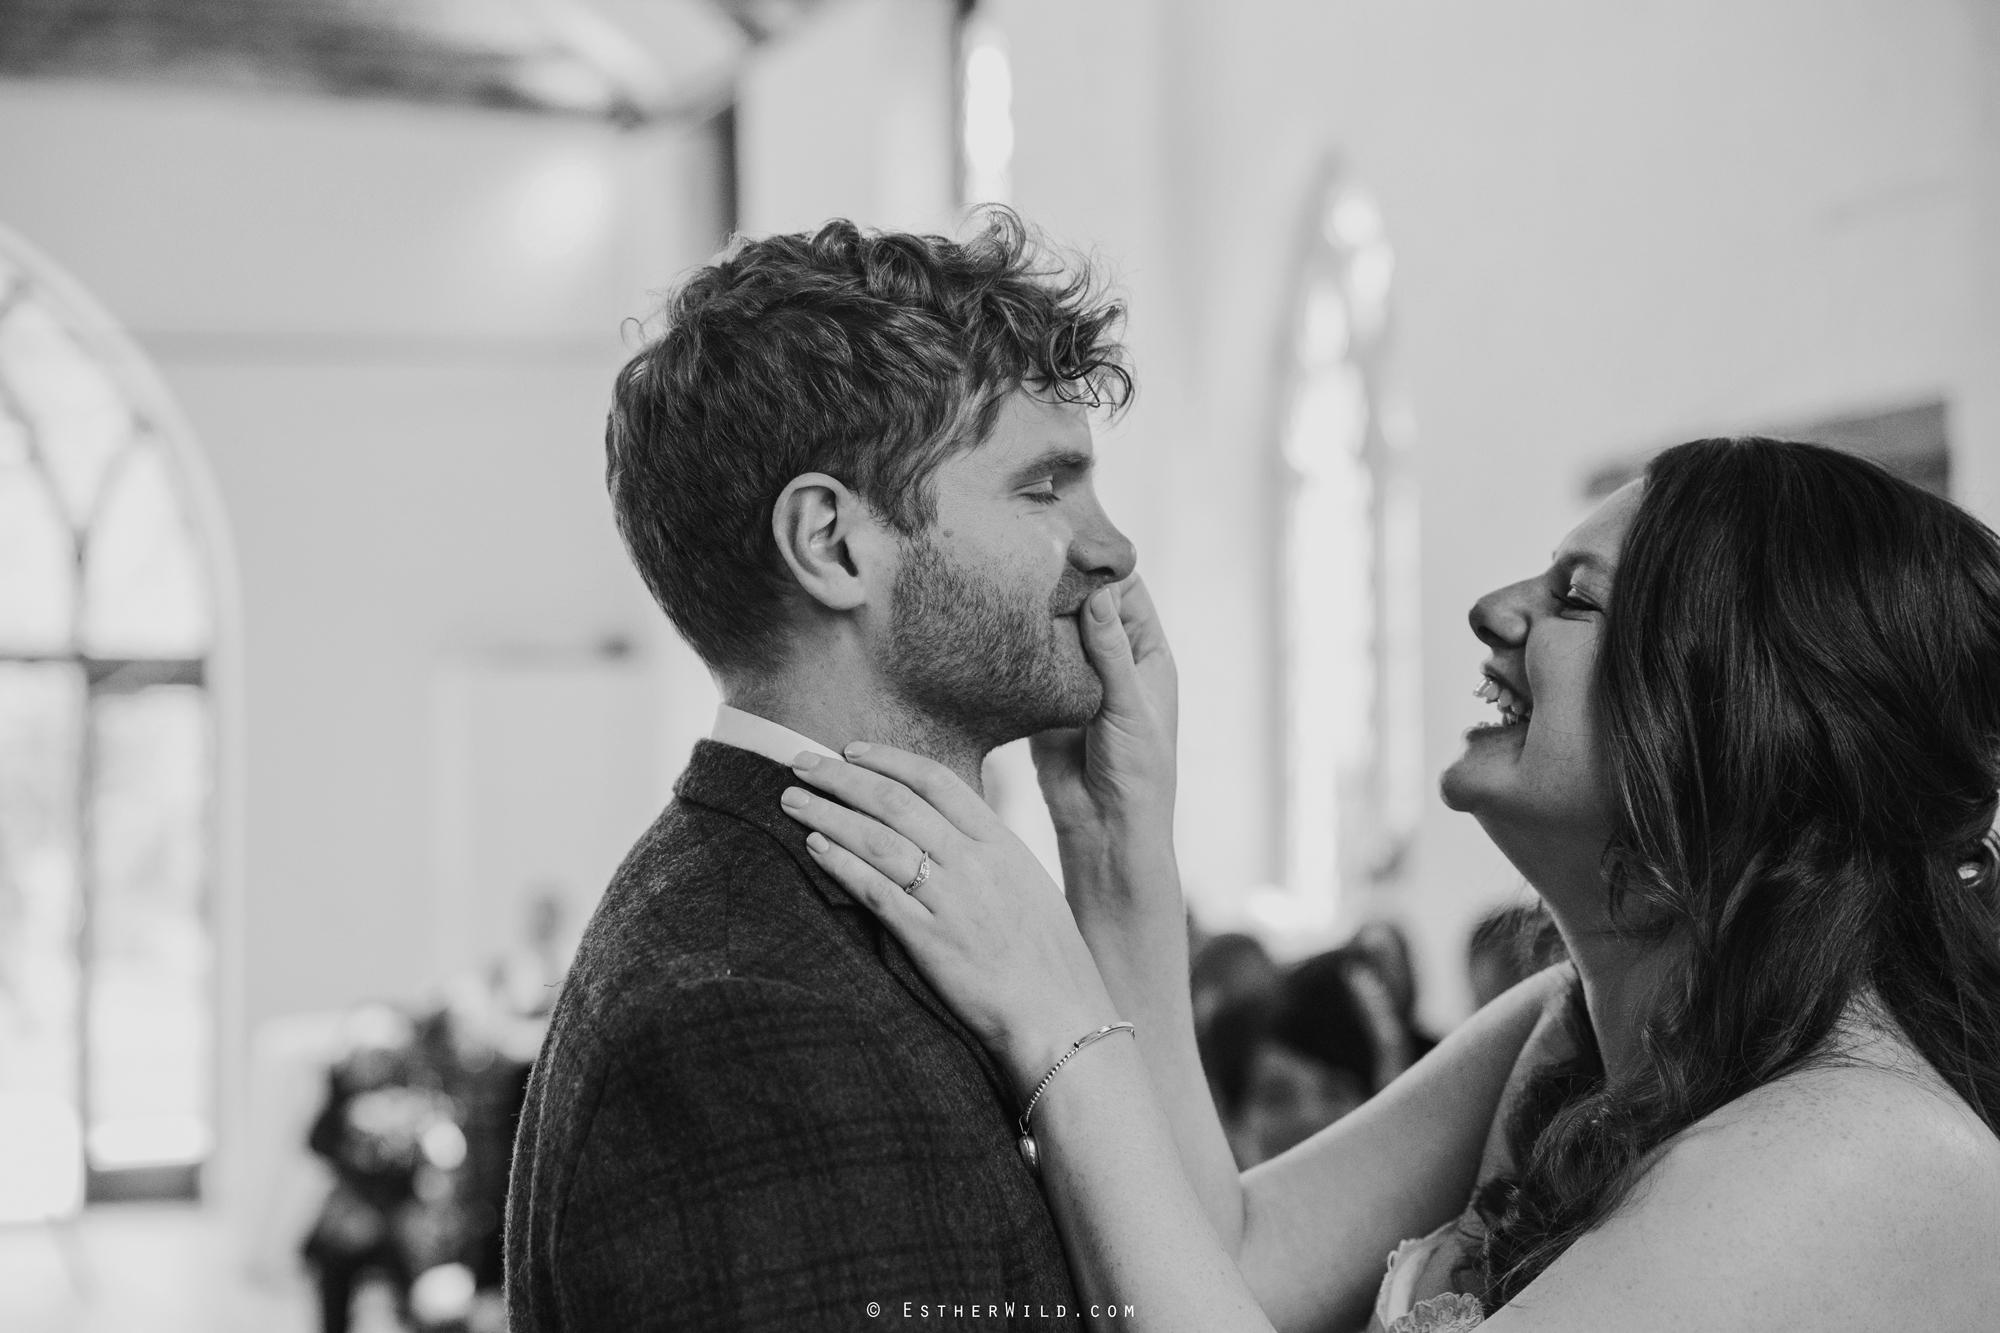 Reading_Room_Weddings_Alby_Norwich_Photographer_Esther_Wild_IMG_0991-1.jpg